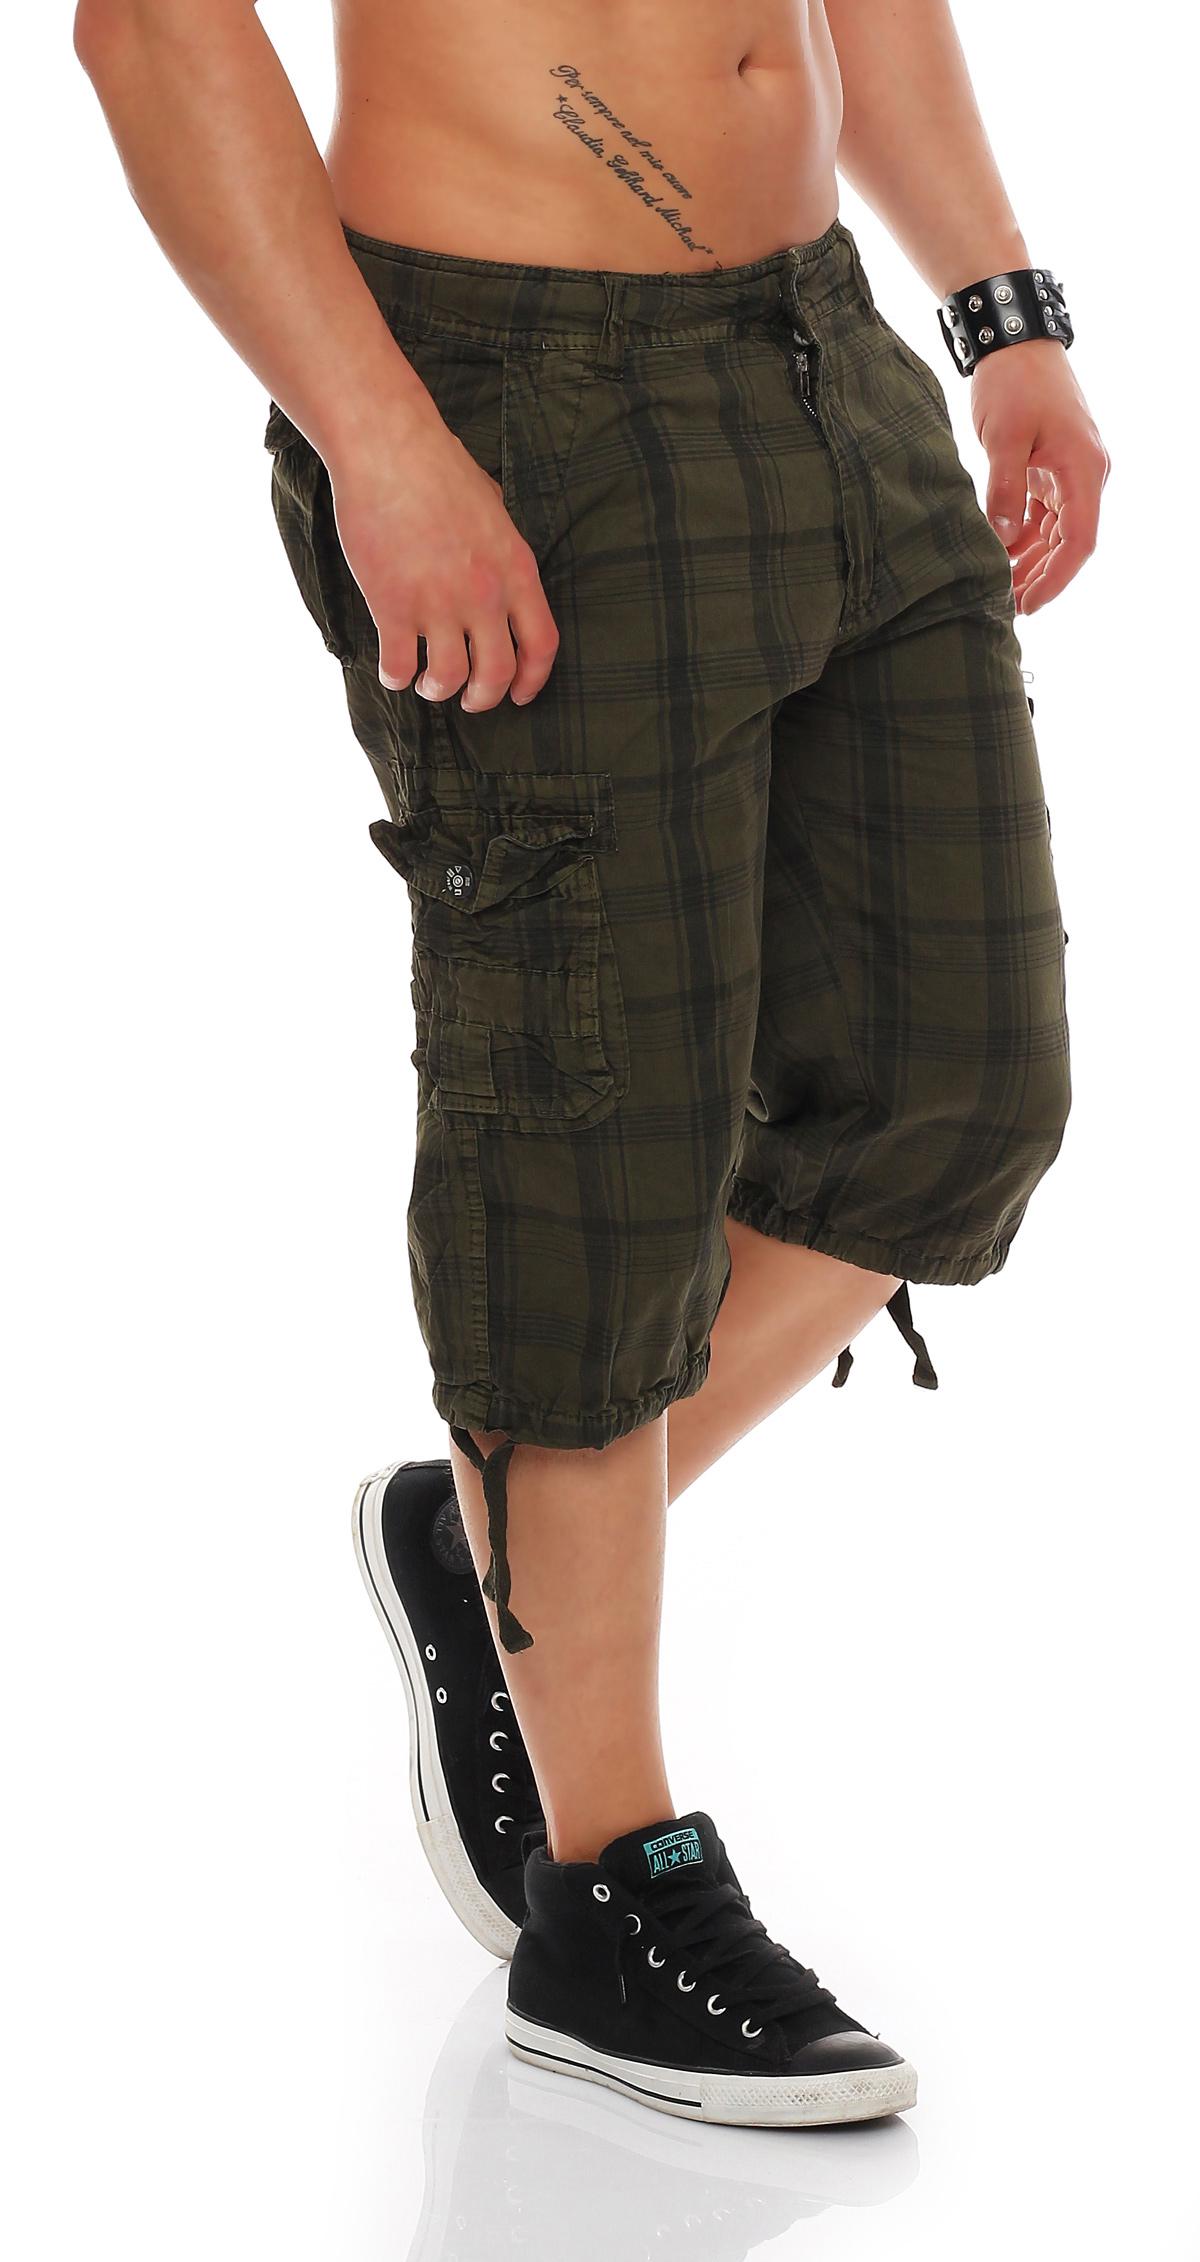 herren shorts kurze capri hose sommer 3 4 bermuda kariert cargo baumwolle l1202 ebay. Black Bedroom Furniture Sets. Home Design Ideas